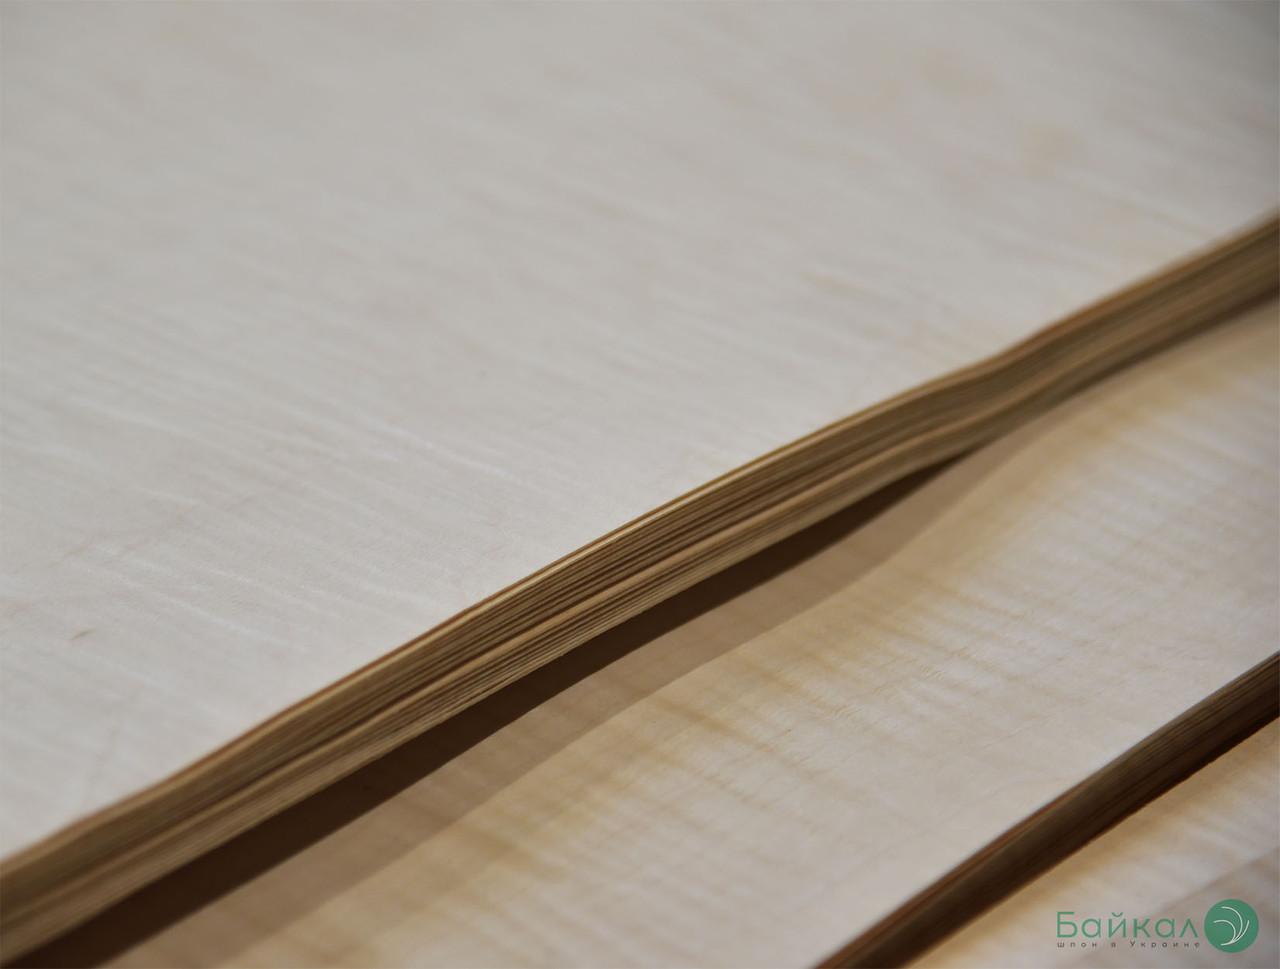 Шпон Клен Сикомора (натуральный) 0,55 мм АВ сорт - 2,10 м+/10 см+